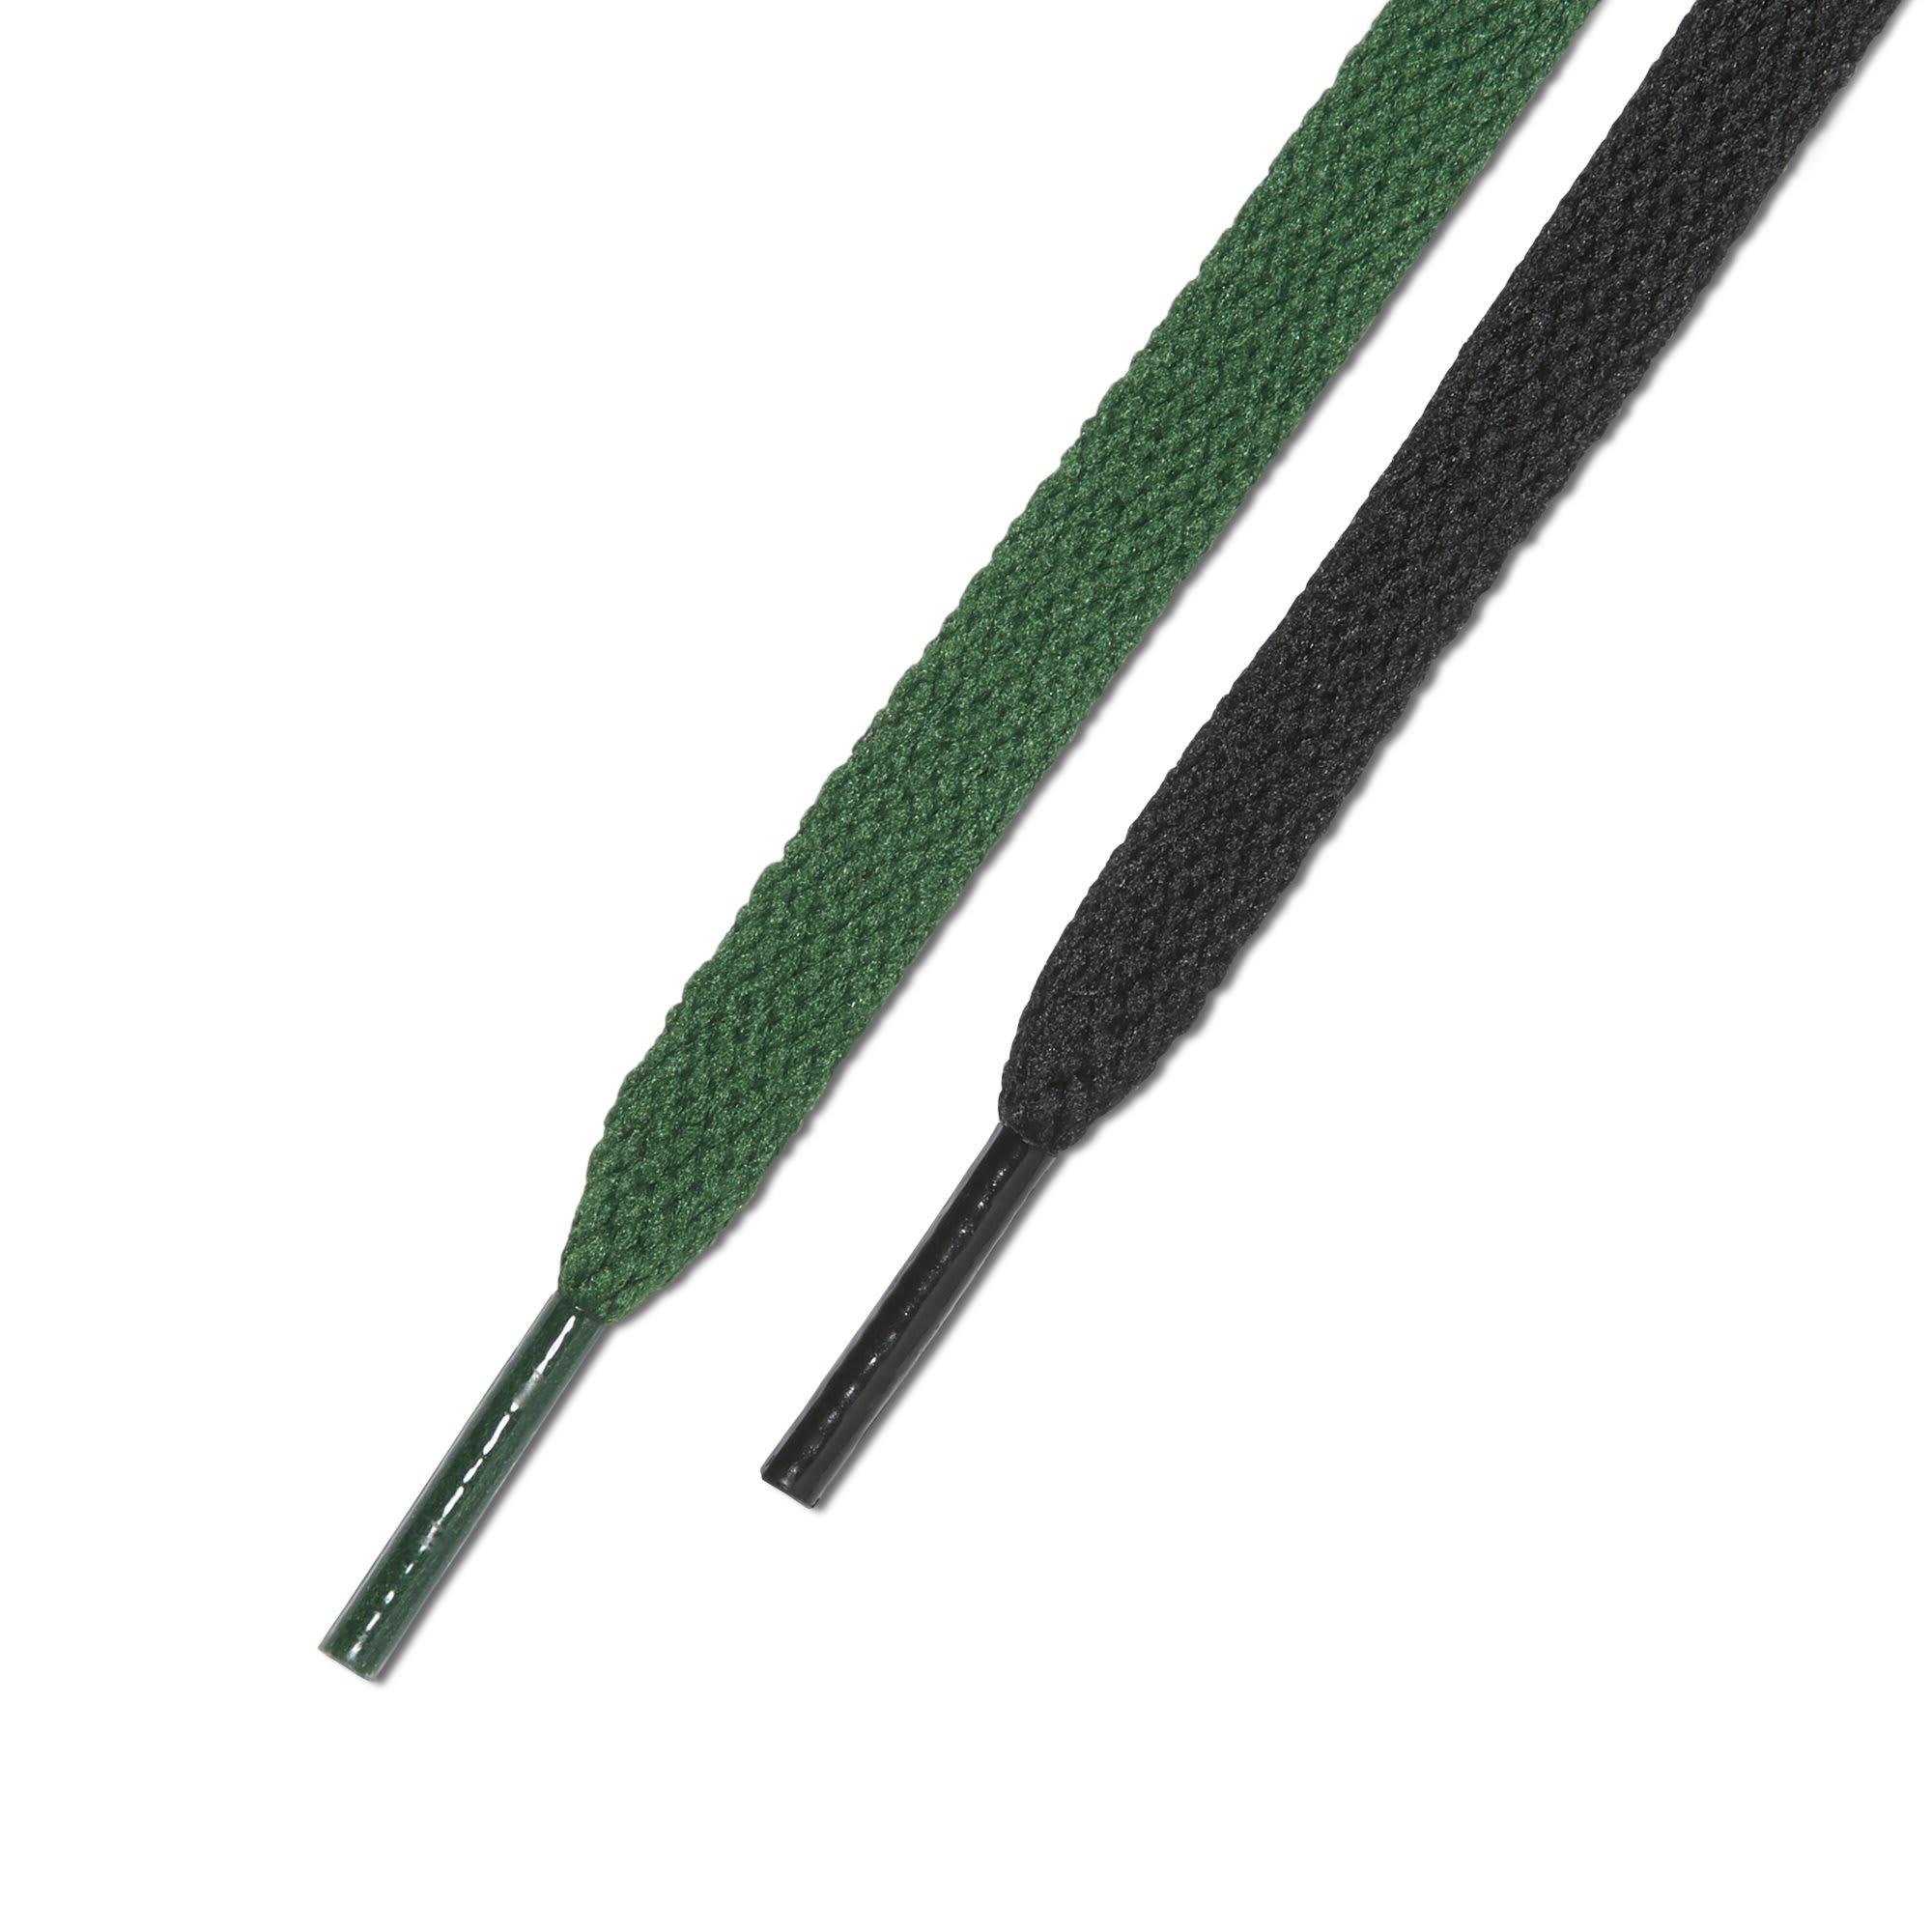 Air Jordan 1 High OG 'Pine Green' 555088-032 (Shoelaces)